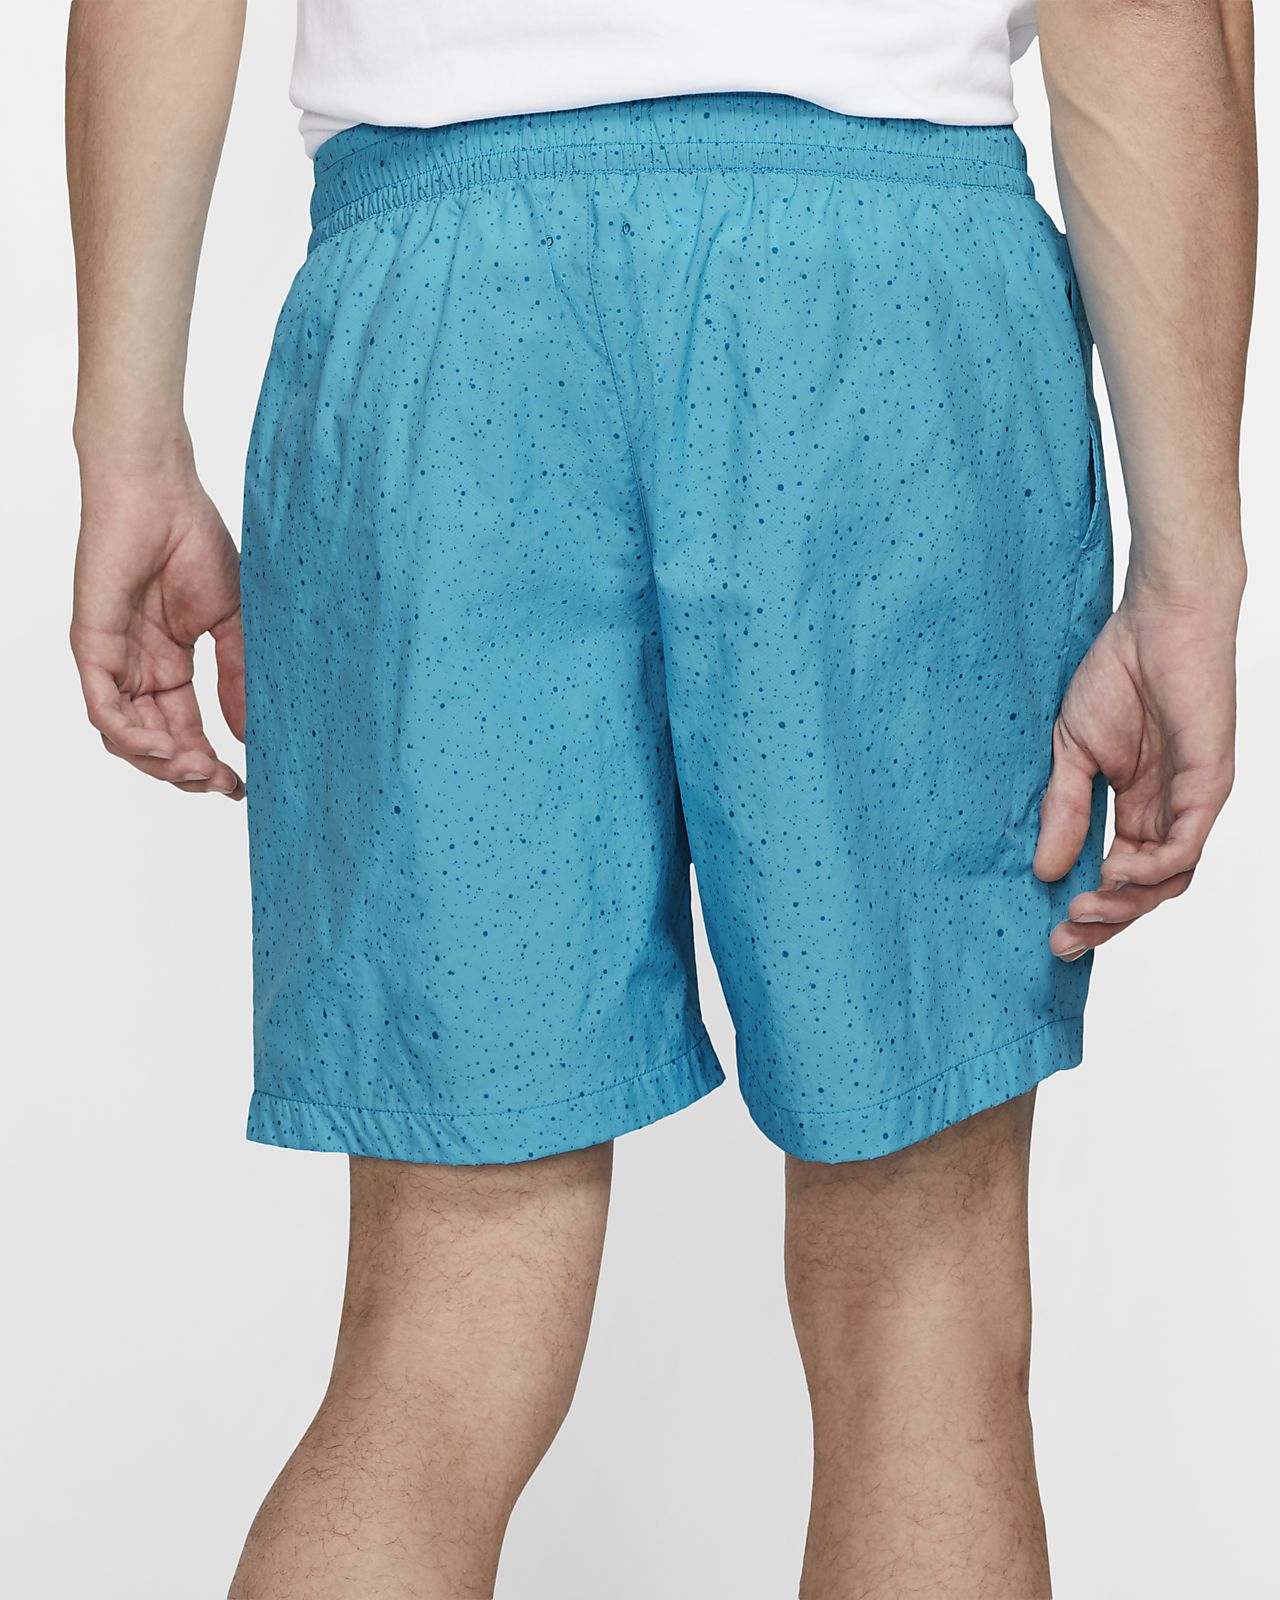 brand new 6a080 43e04 Shorts Jordan Jumpman Cement Poolside Men s 18cm approx. Shorts